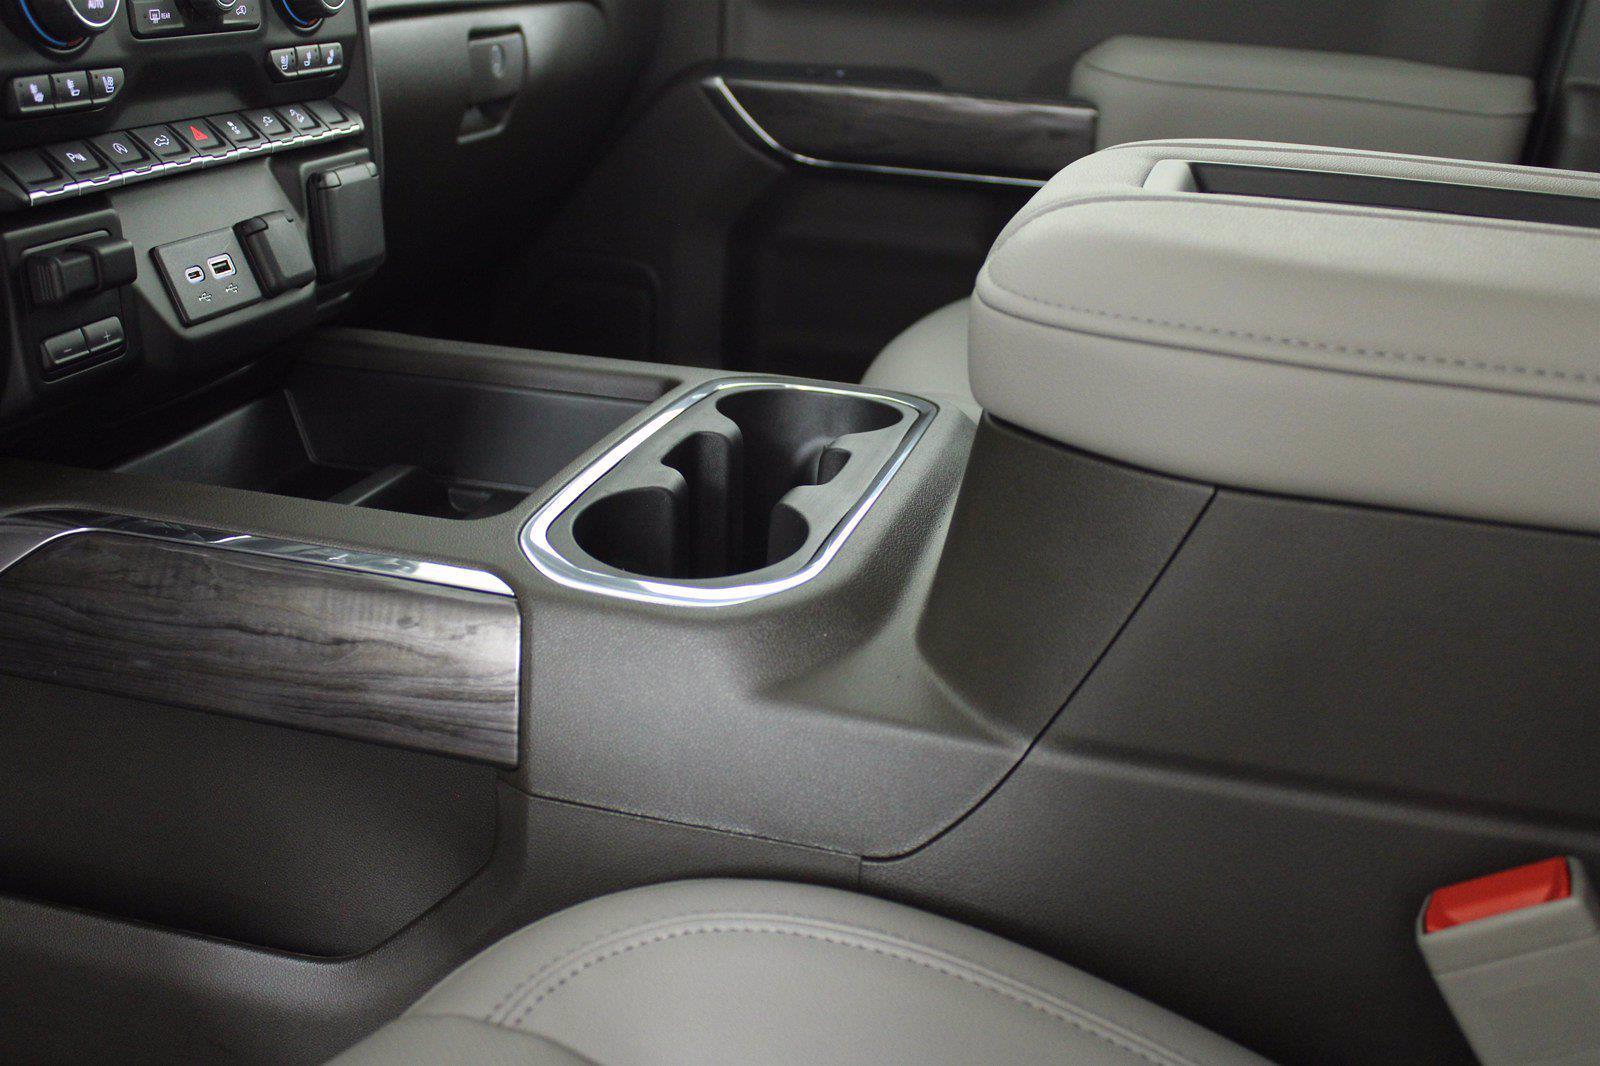 2021 Chevrolet Silverado 1500 Crew Cab 4x4, Pickup #D111155 - photo 13